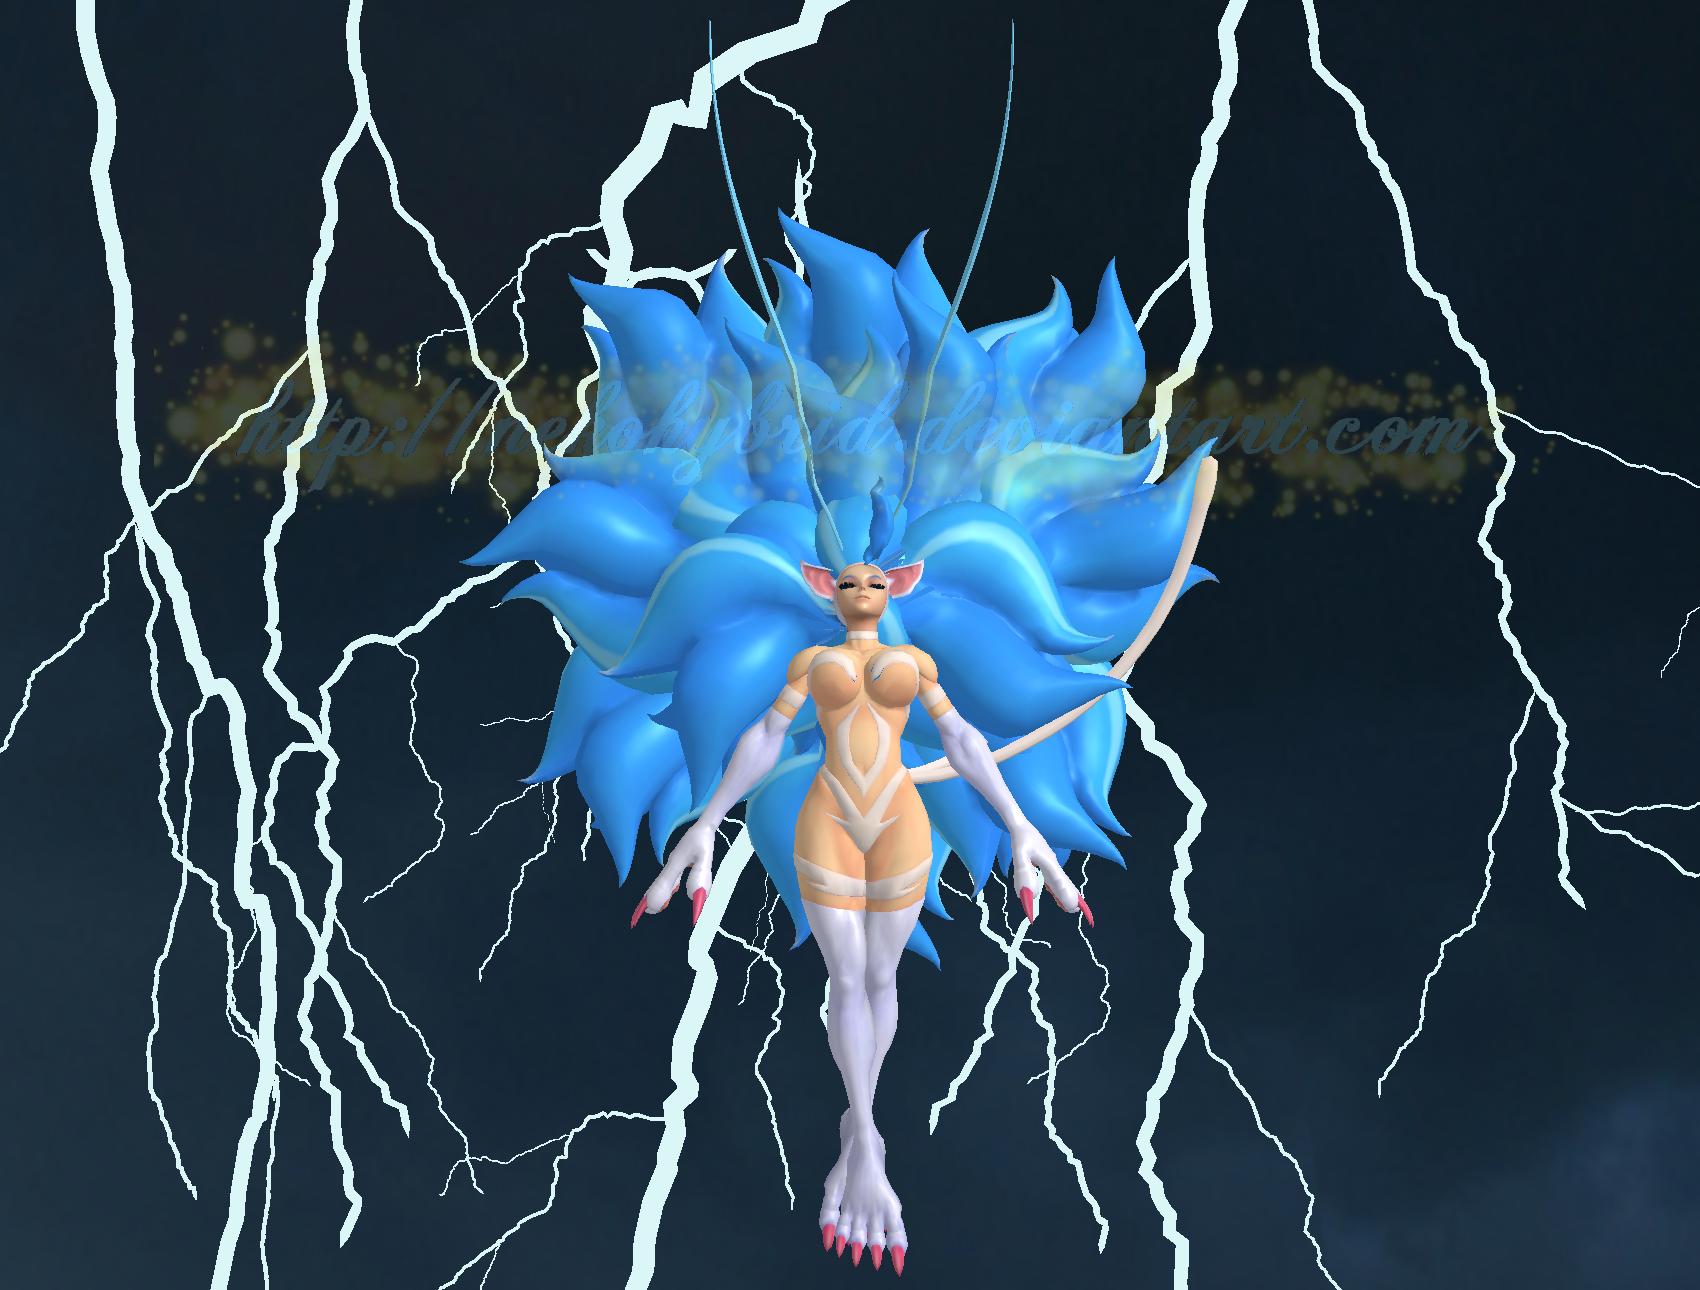 Felicia Powered Up! by NekoHybrid